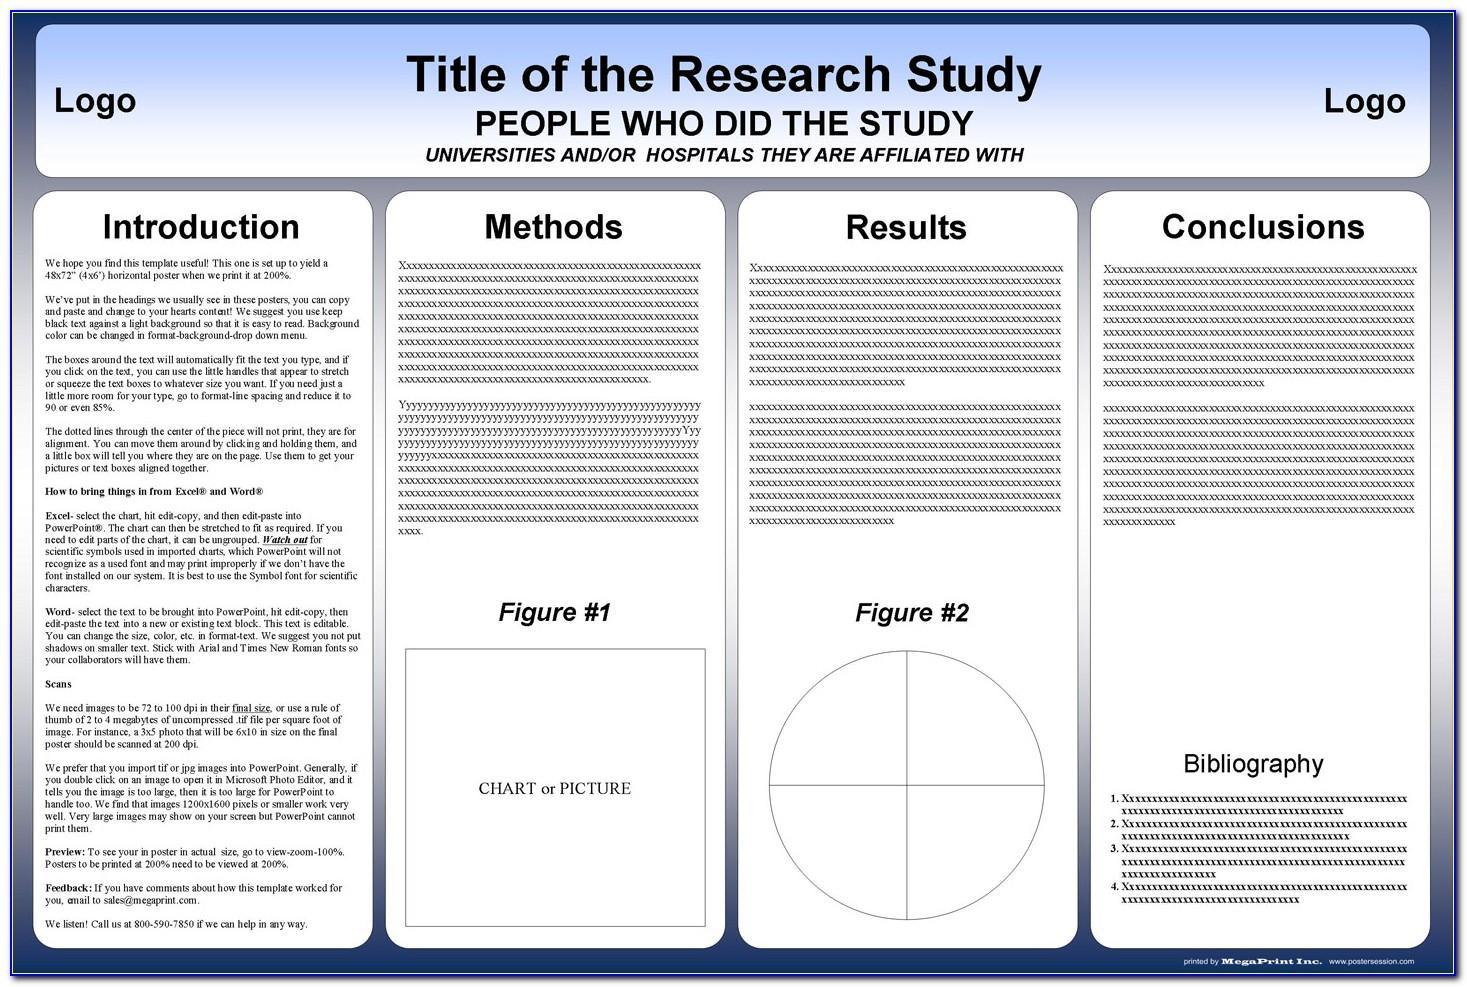 Online Scientific Poster Template